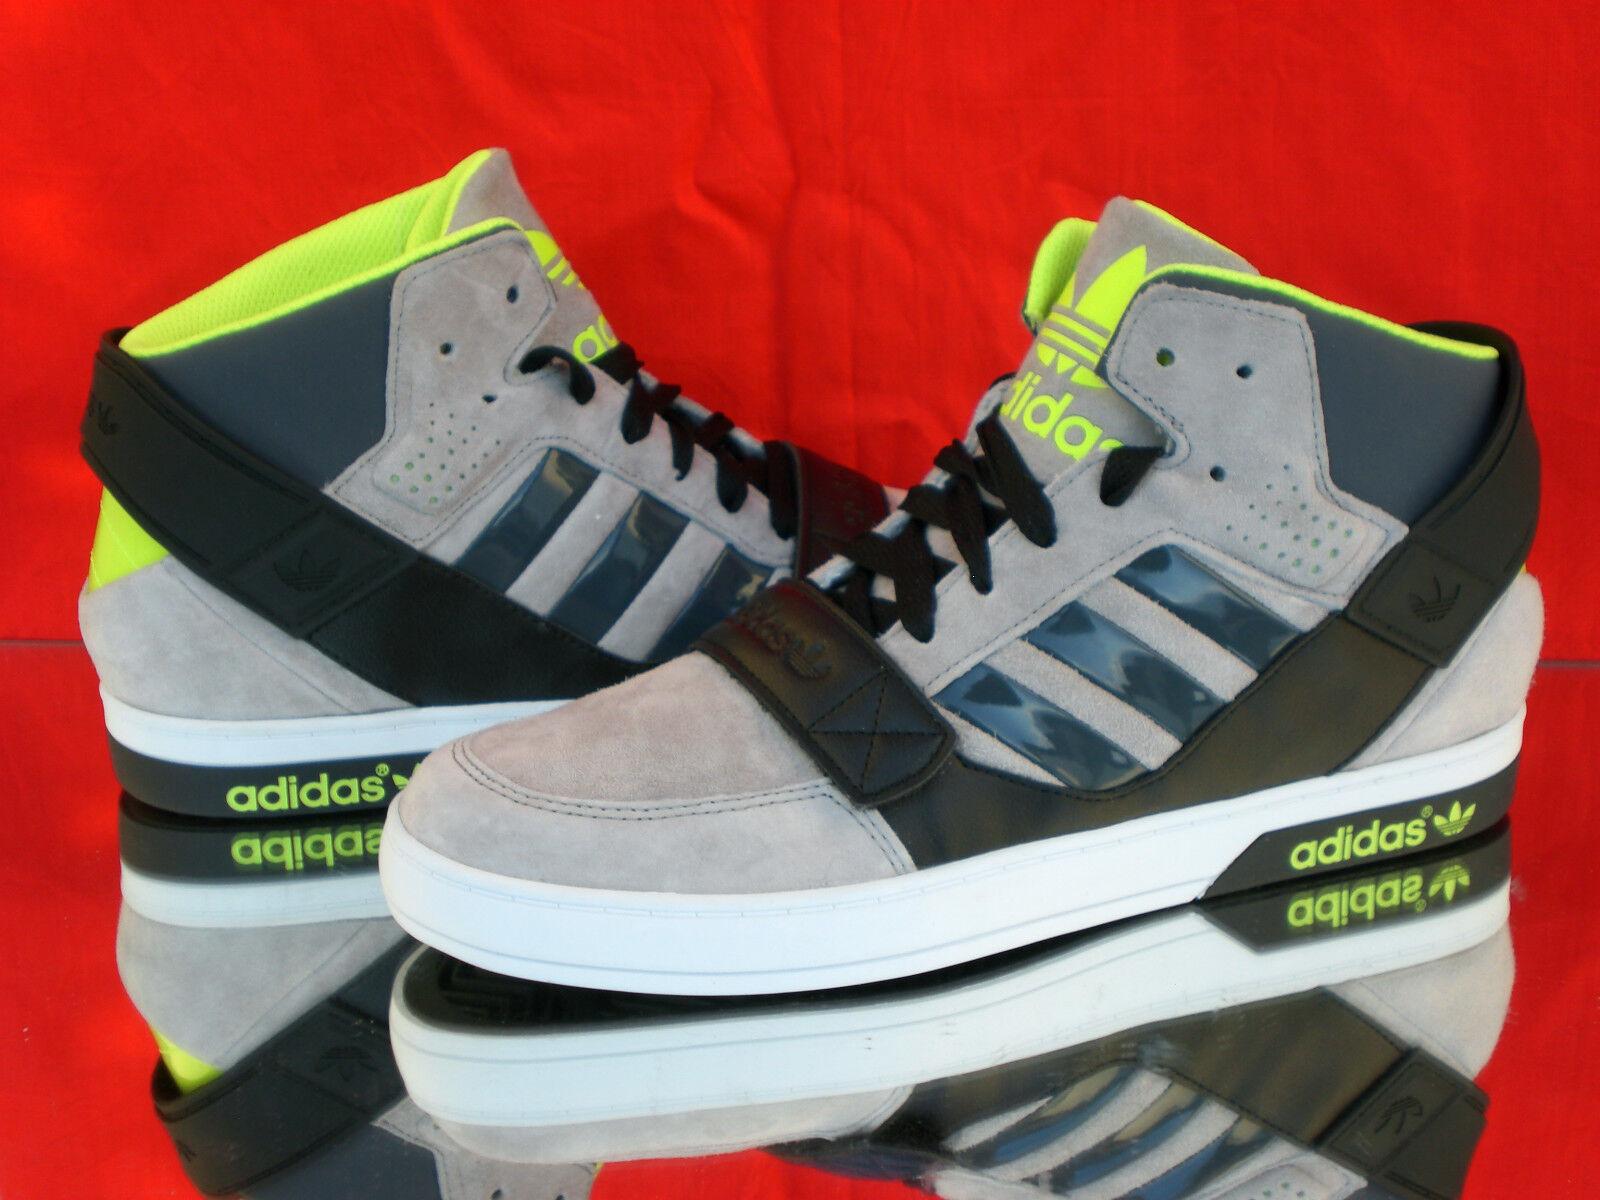 ADIDAS Originals hardcourt Scarpe Defender dicina-Top Sneaker Grigio/Nero/Giallo m22333neu Scarpe hardcourt classiche da uomo afd535